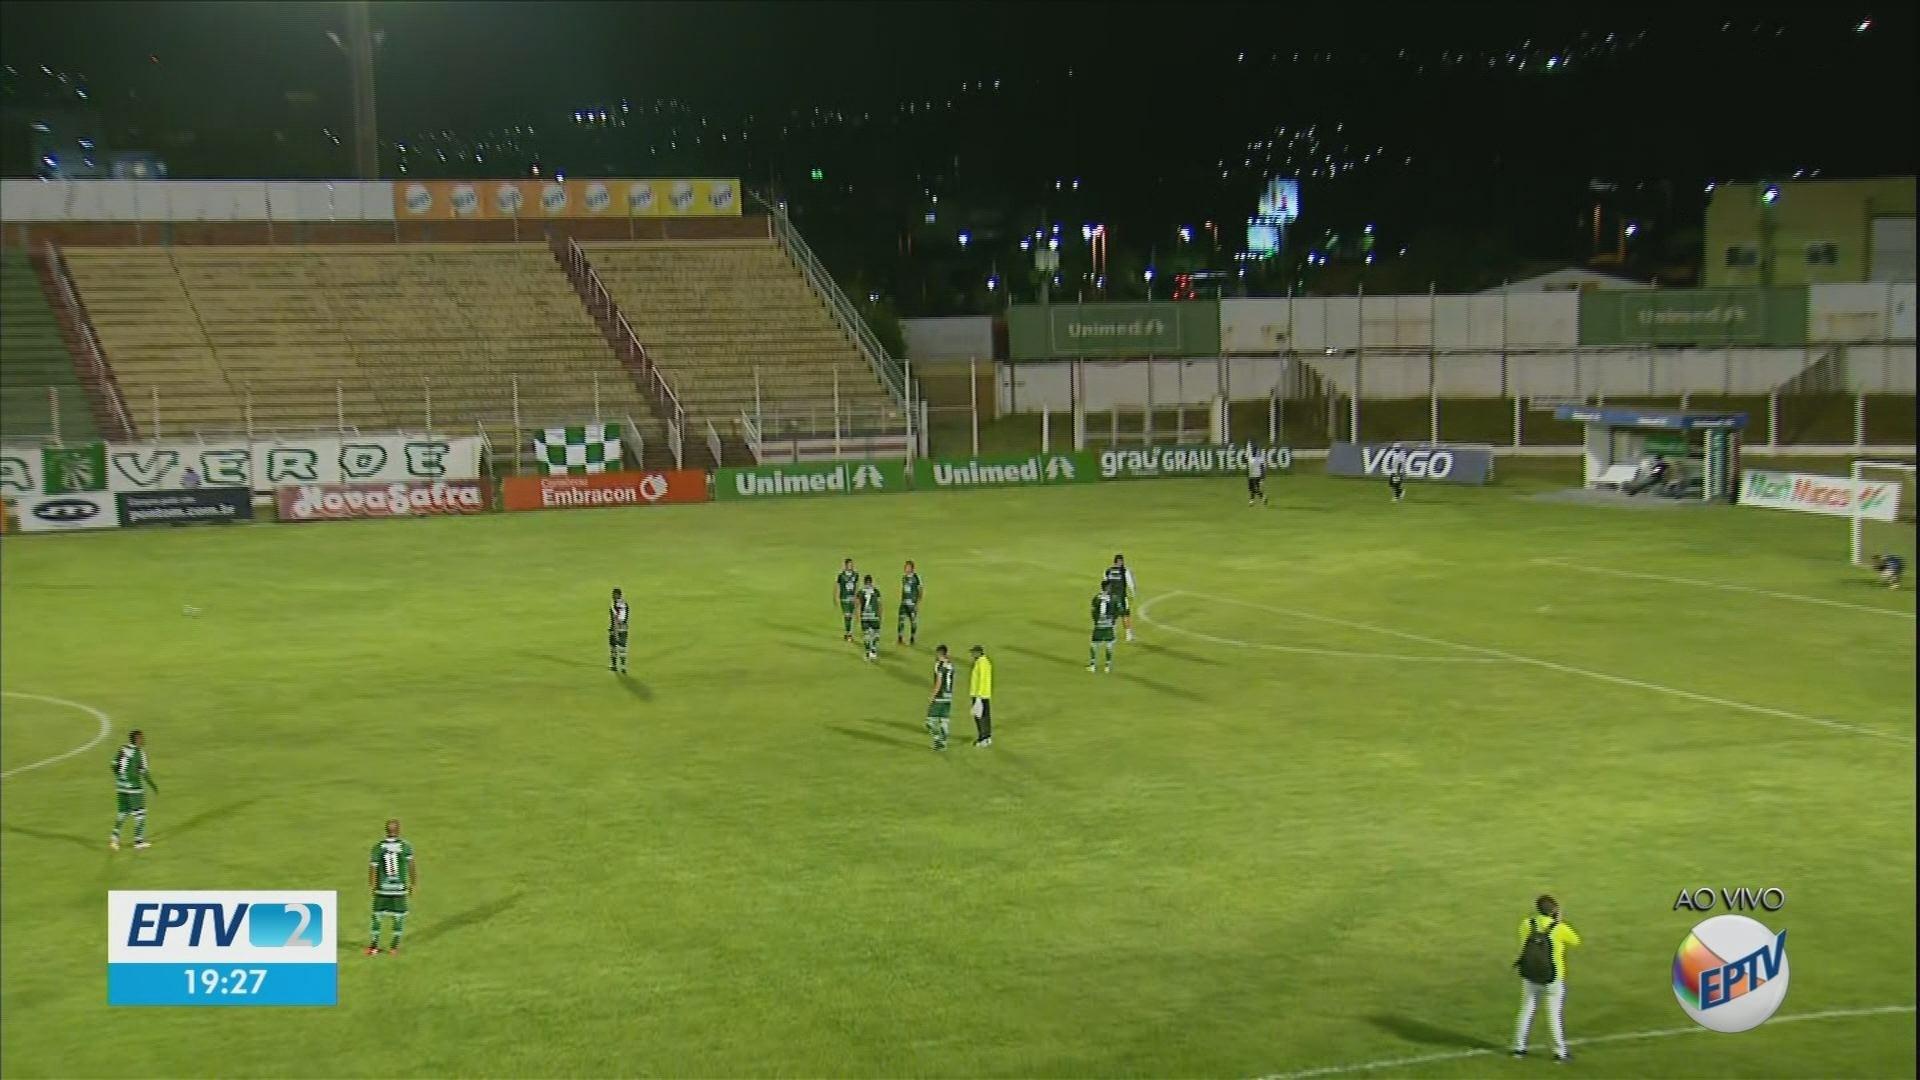 VÍDEOS: EPTV 2 Sul de Minas de sábado, 26 de setembro